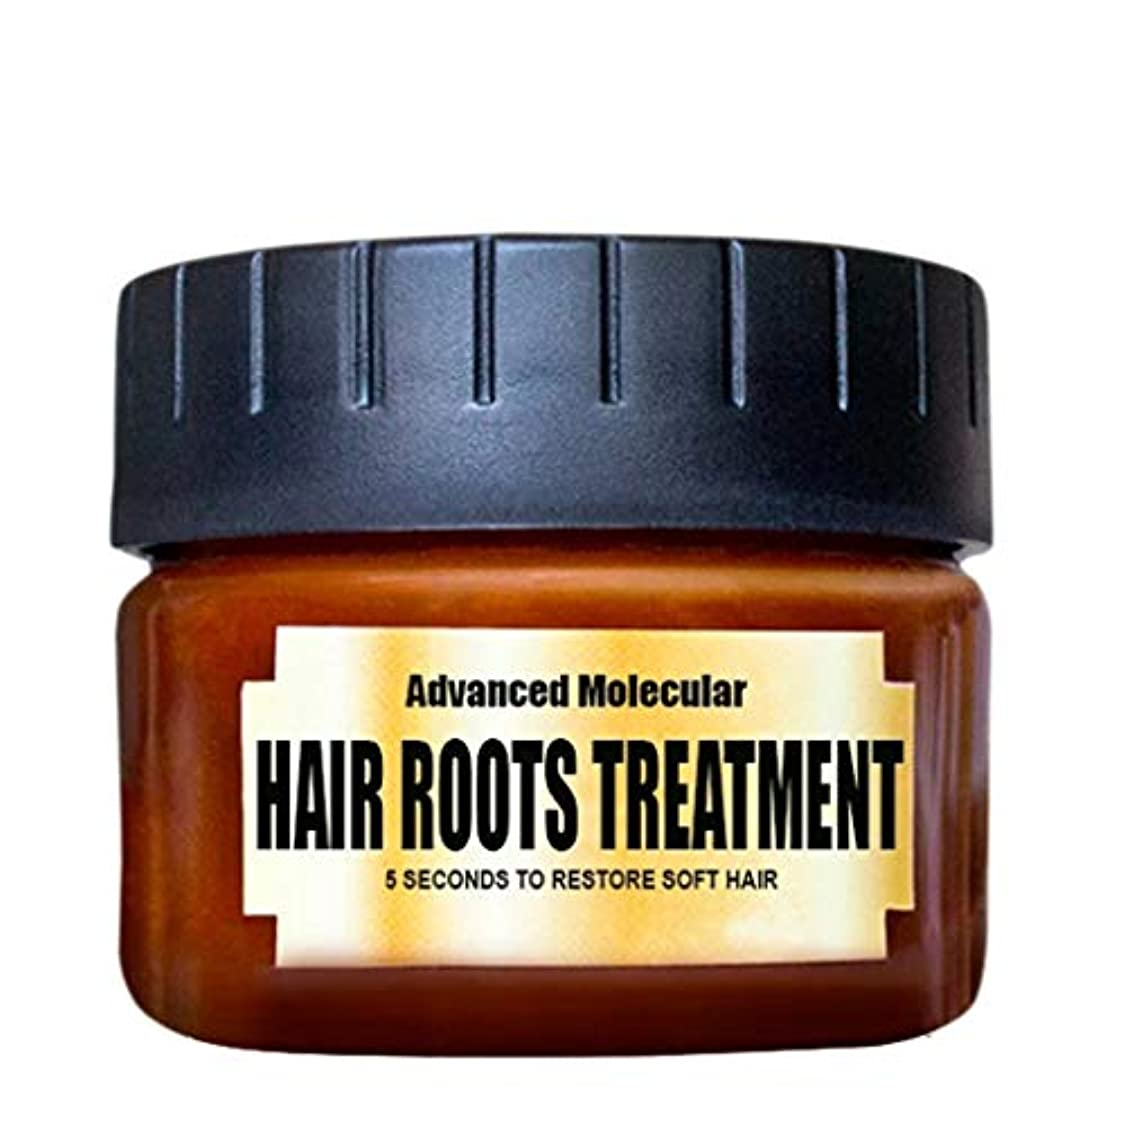 DOUJI 天然植物成分 ヘアケア リッチリペア コンディショナー60ml コンディショナー 髪の解毒ヘアマスク高度な分子毛根治療回復エクストラダメージケア トリートメント